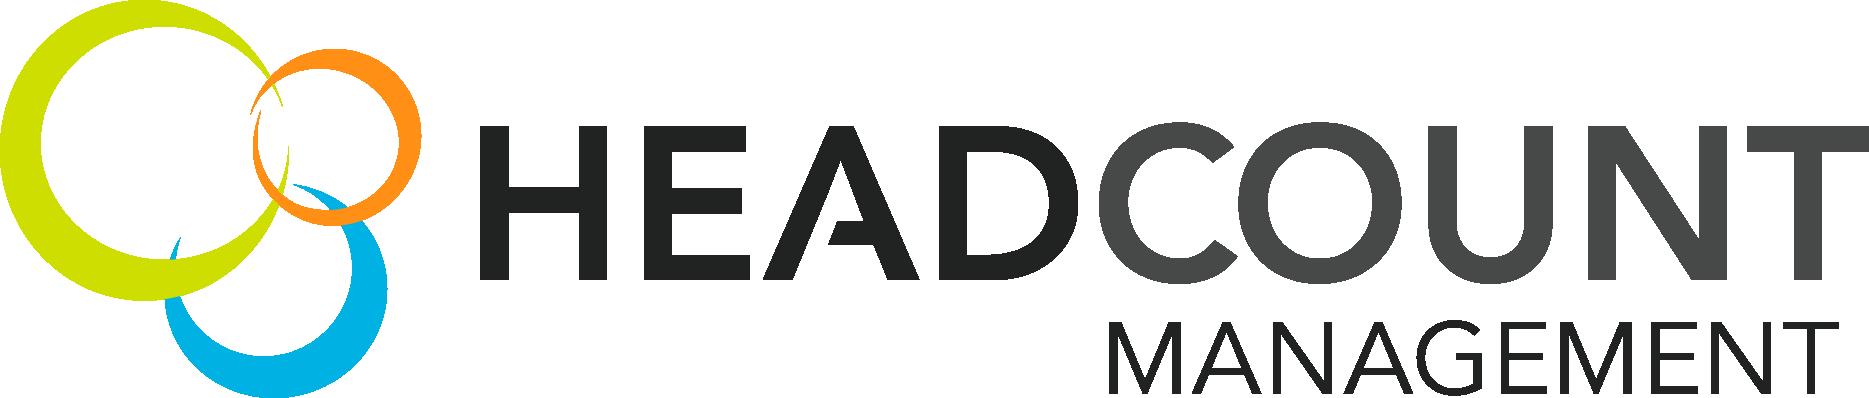 HeadCountMgmt_logo_RGB_Final